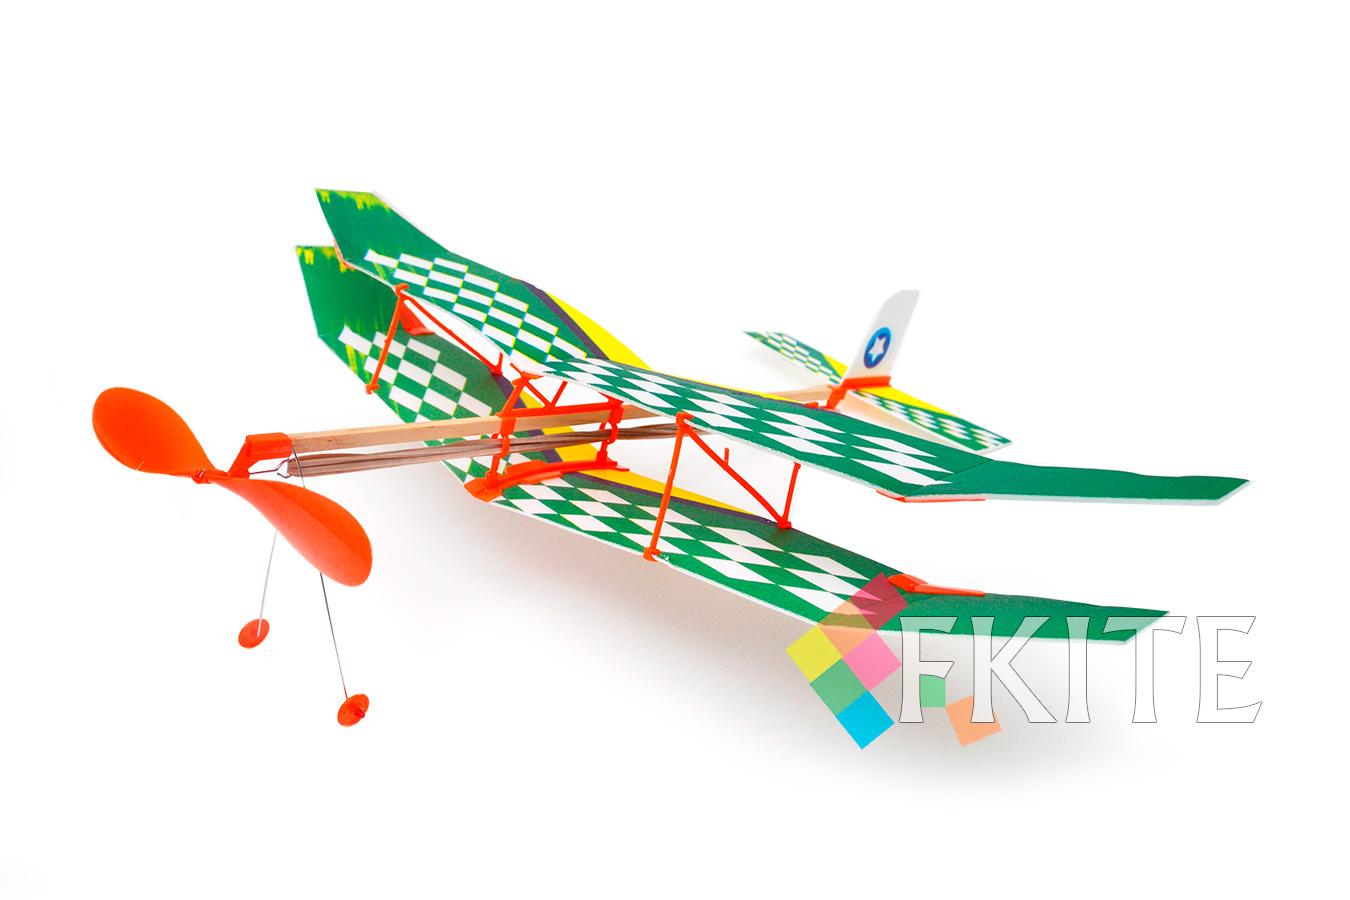 Самолет Лебедь XI на резинке [FLXIL]